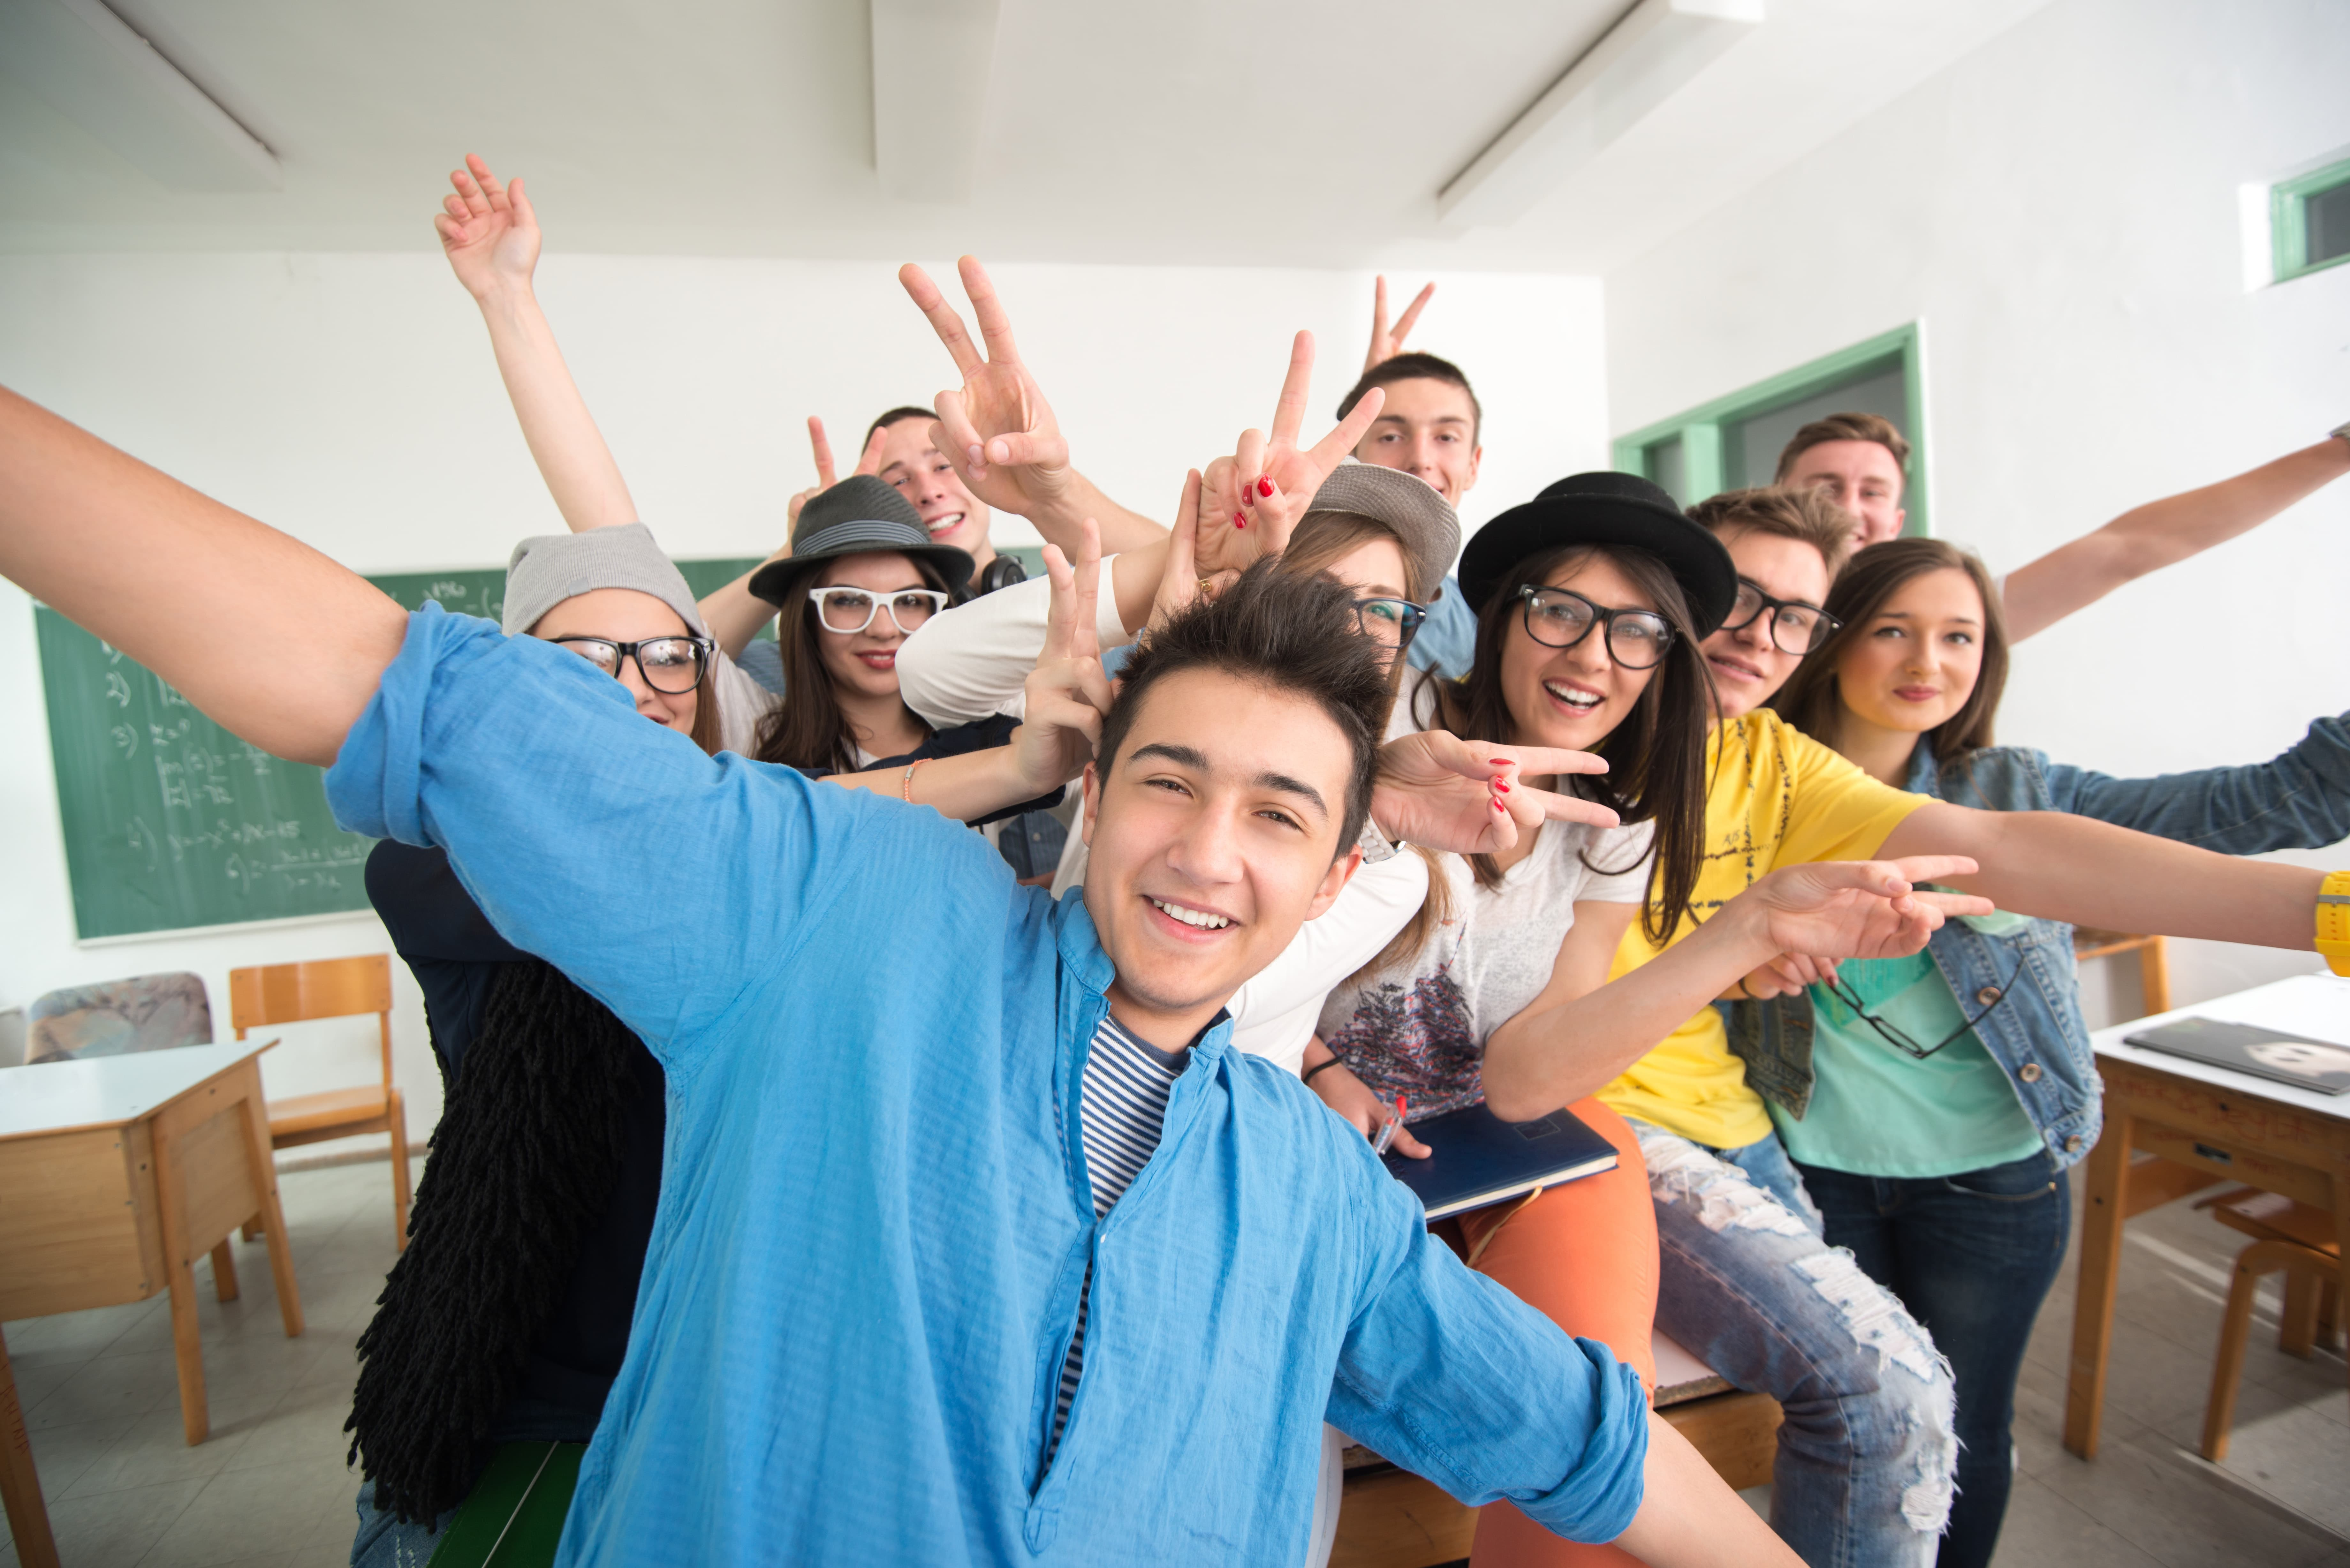 Cheerful classmates posing in classroom